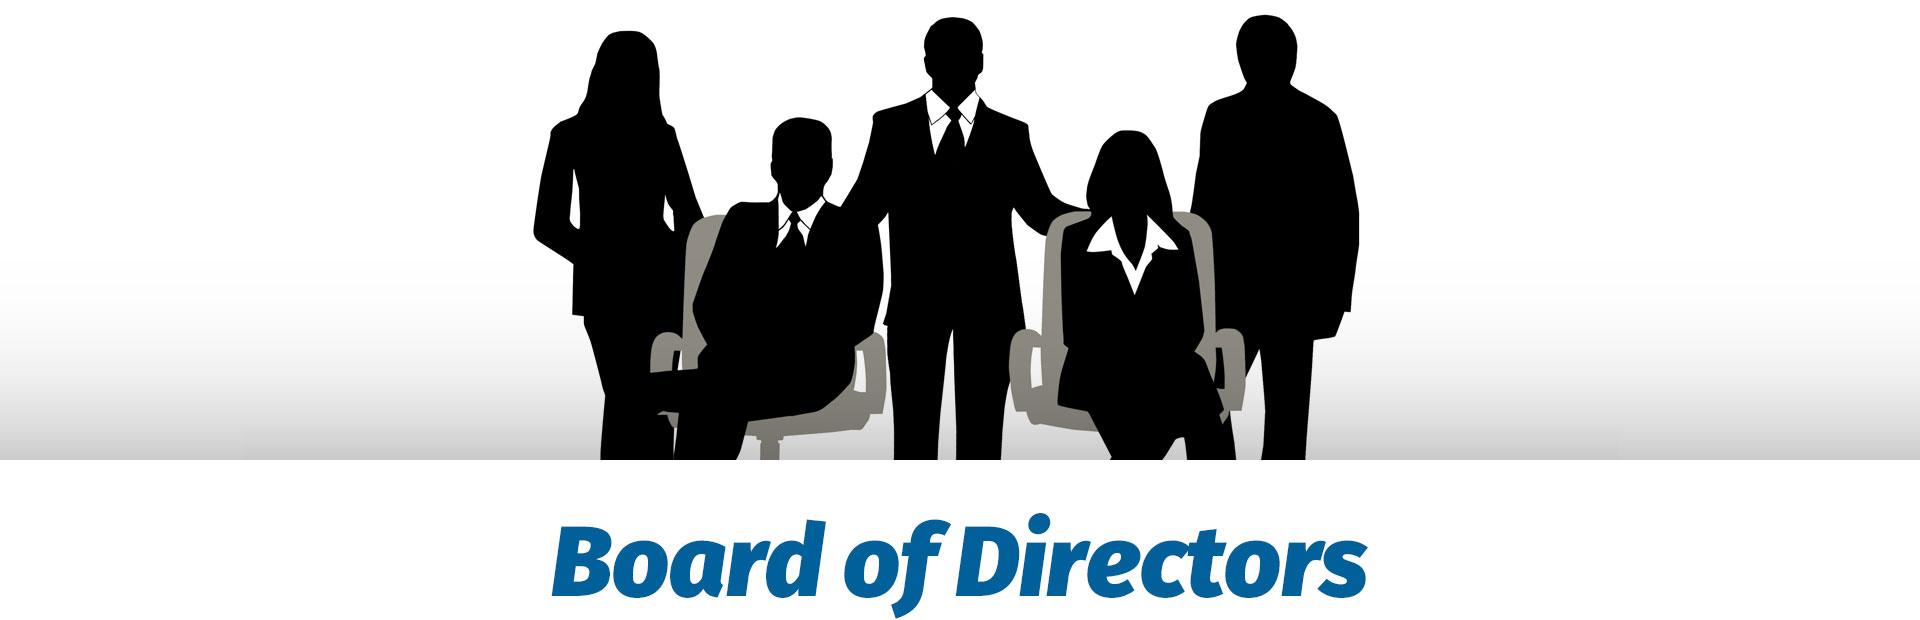 kleinlife directors, active adult community, senior community directors